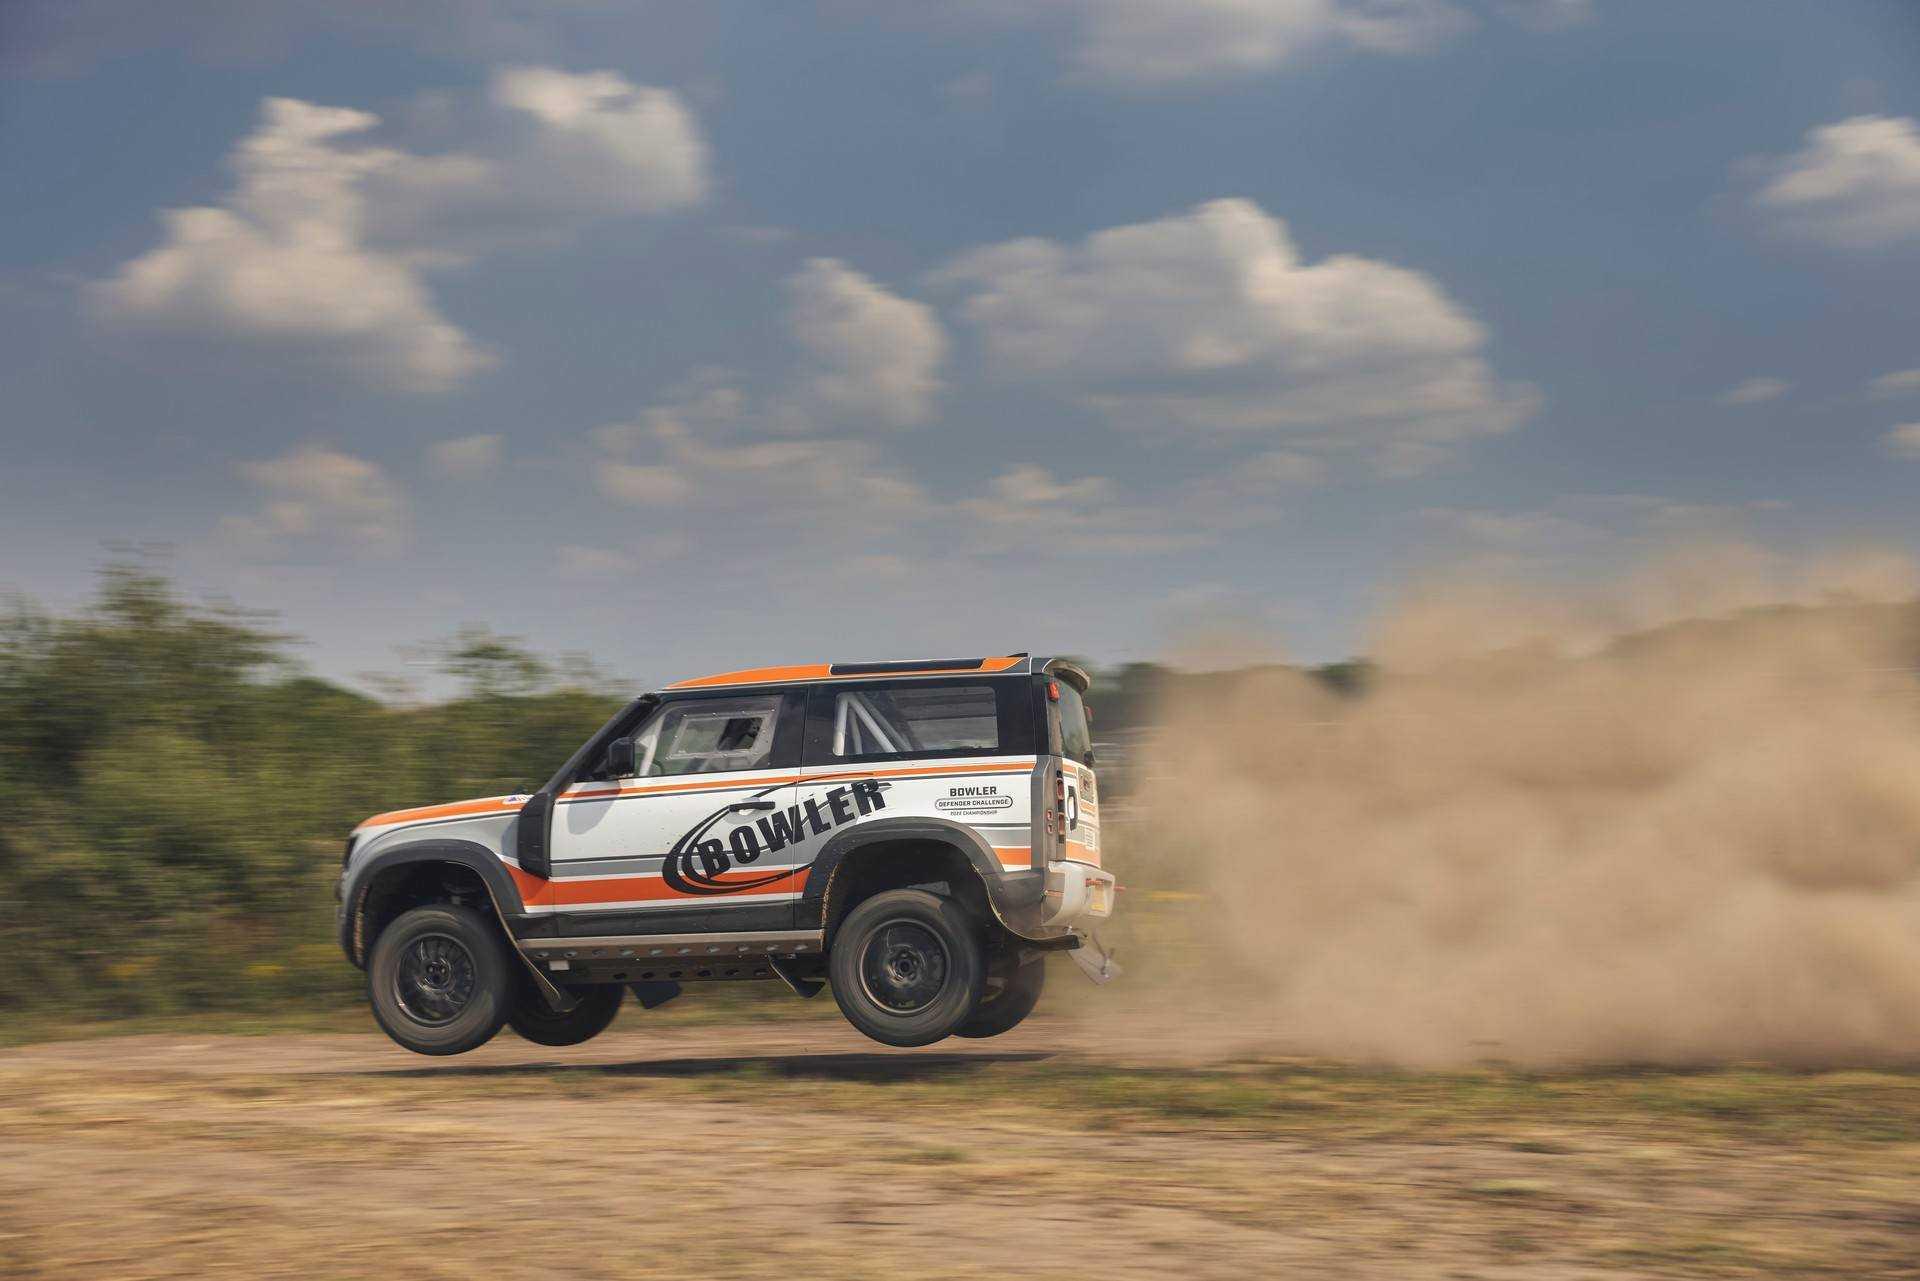 Bowler-Land-Rover-Defender-Challenge-Rally-Car-15